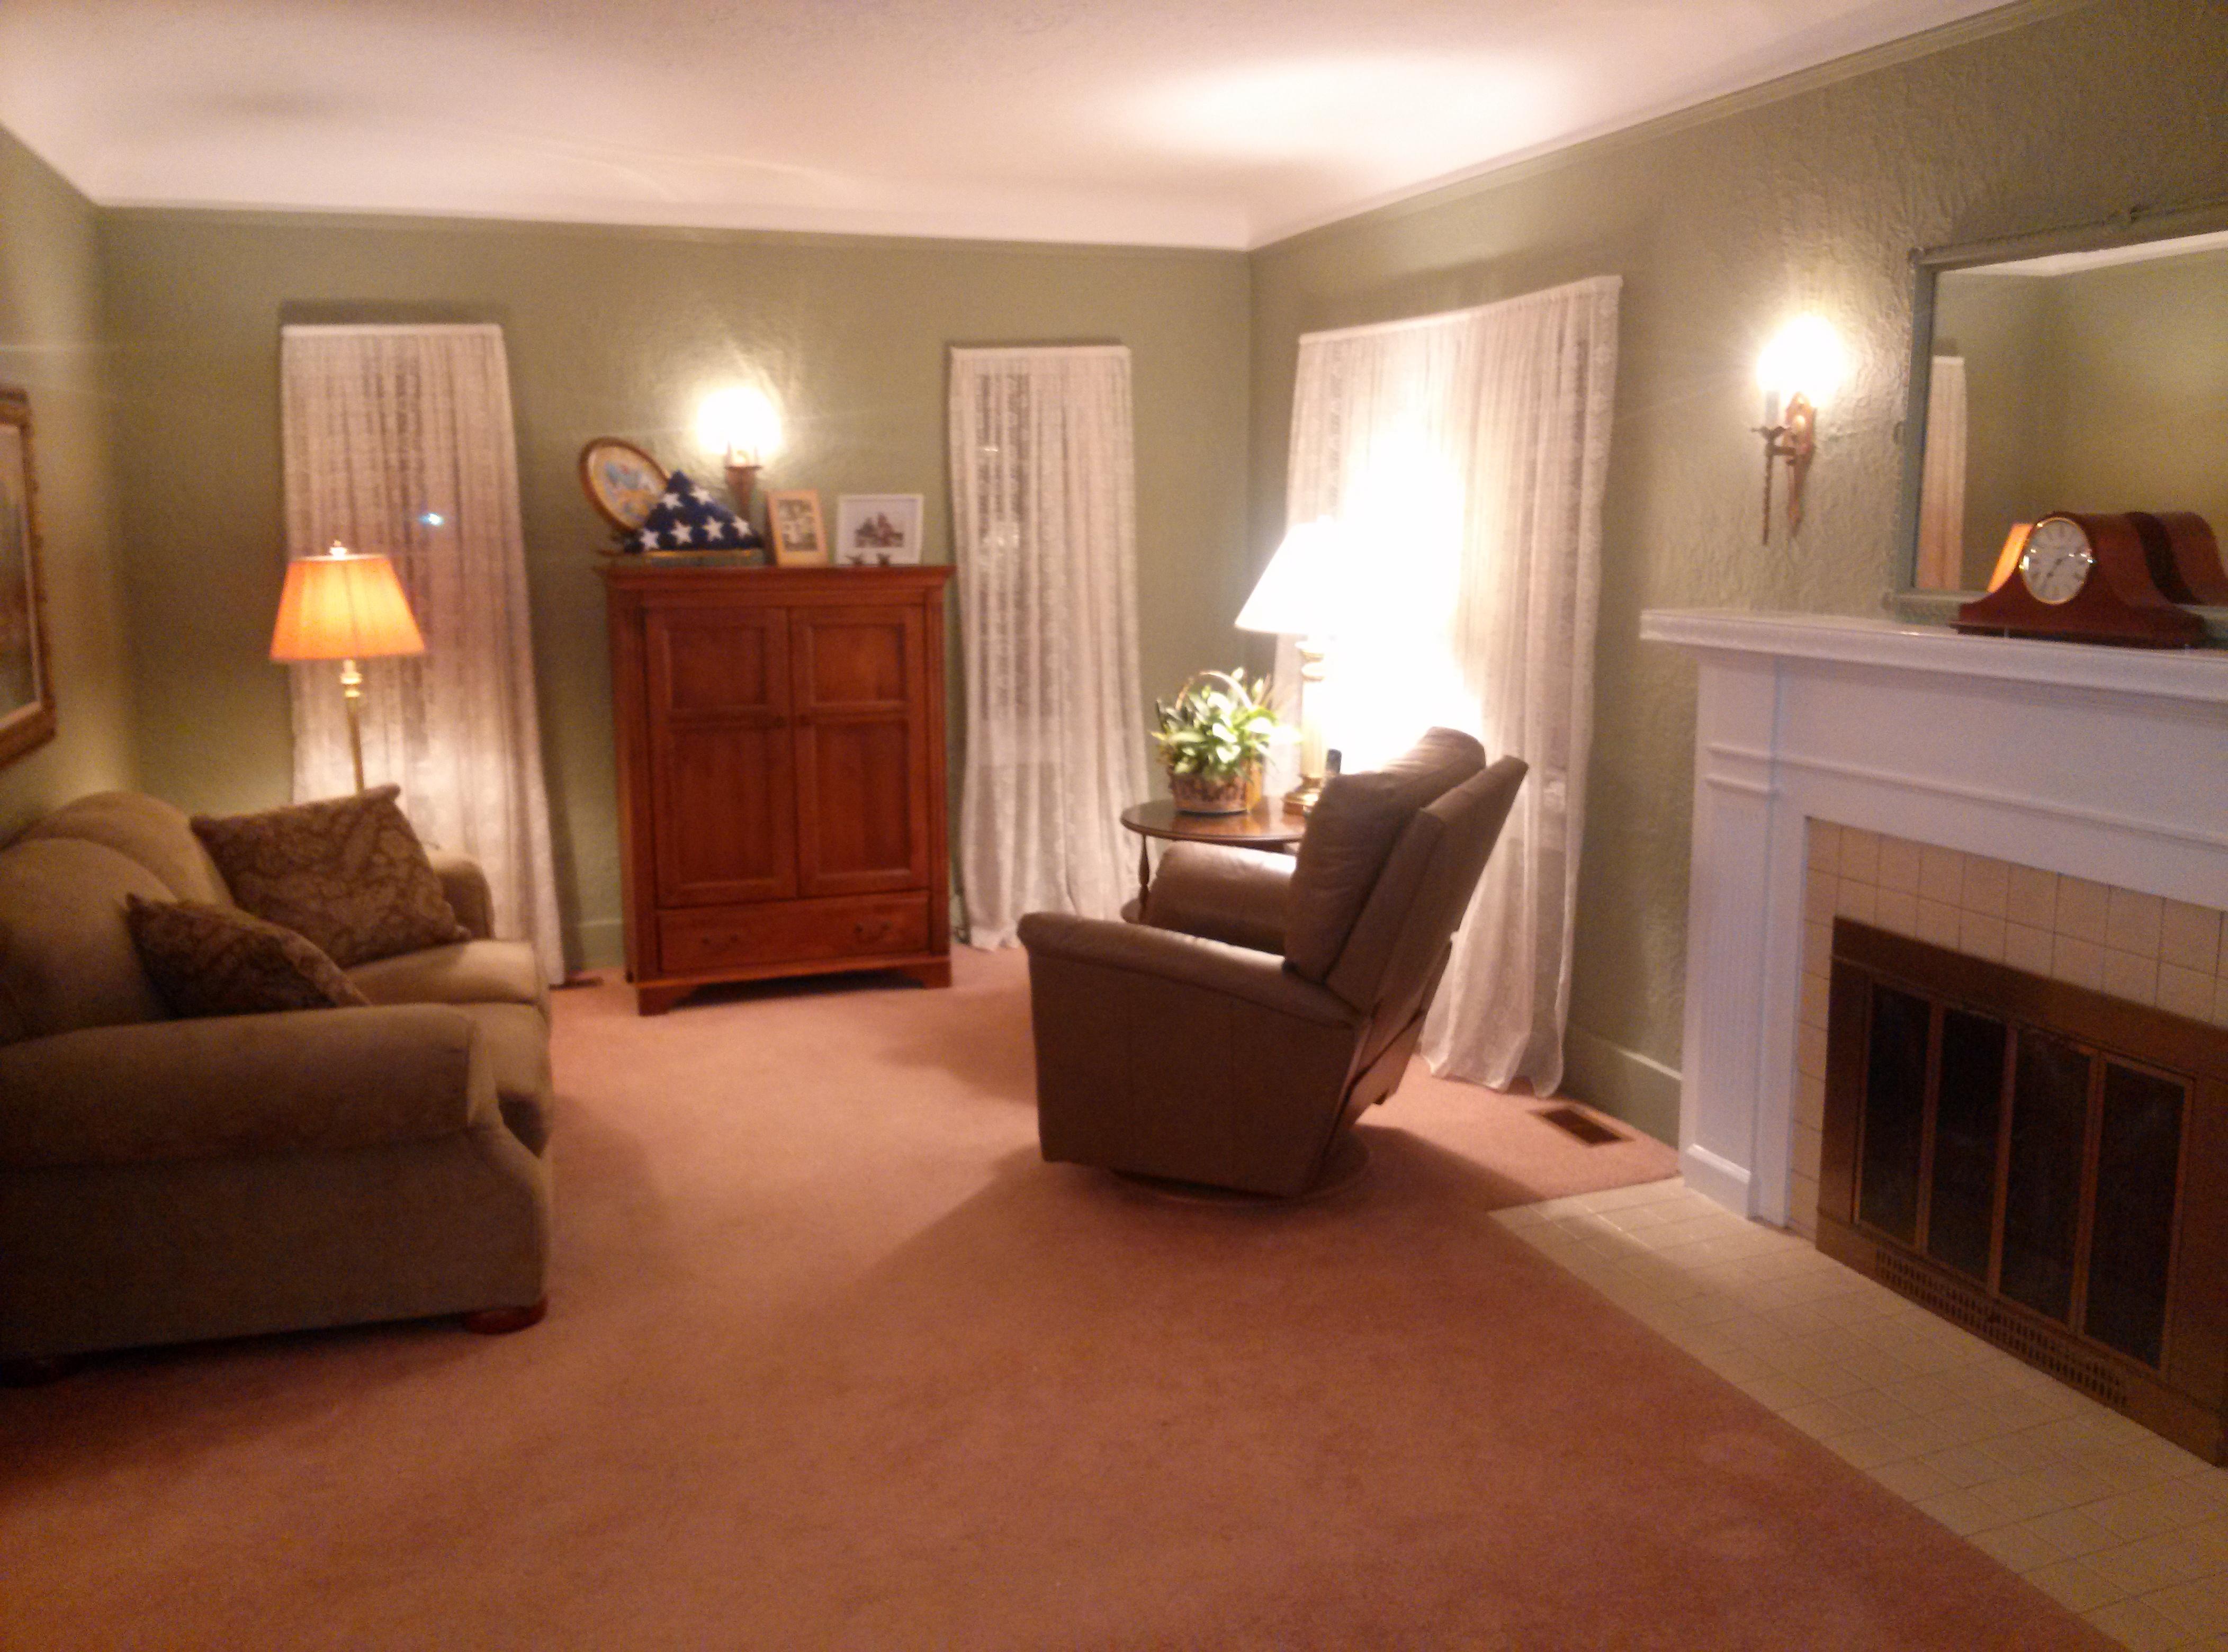 33910 La Moyne St Coventry Gardens Livonia Michigan Home For Sale